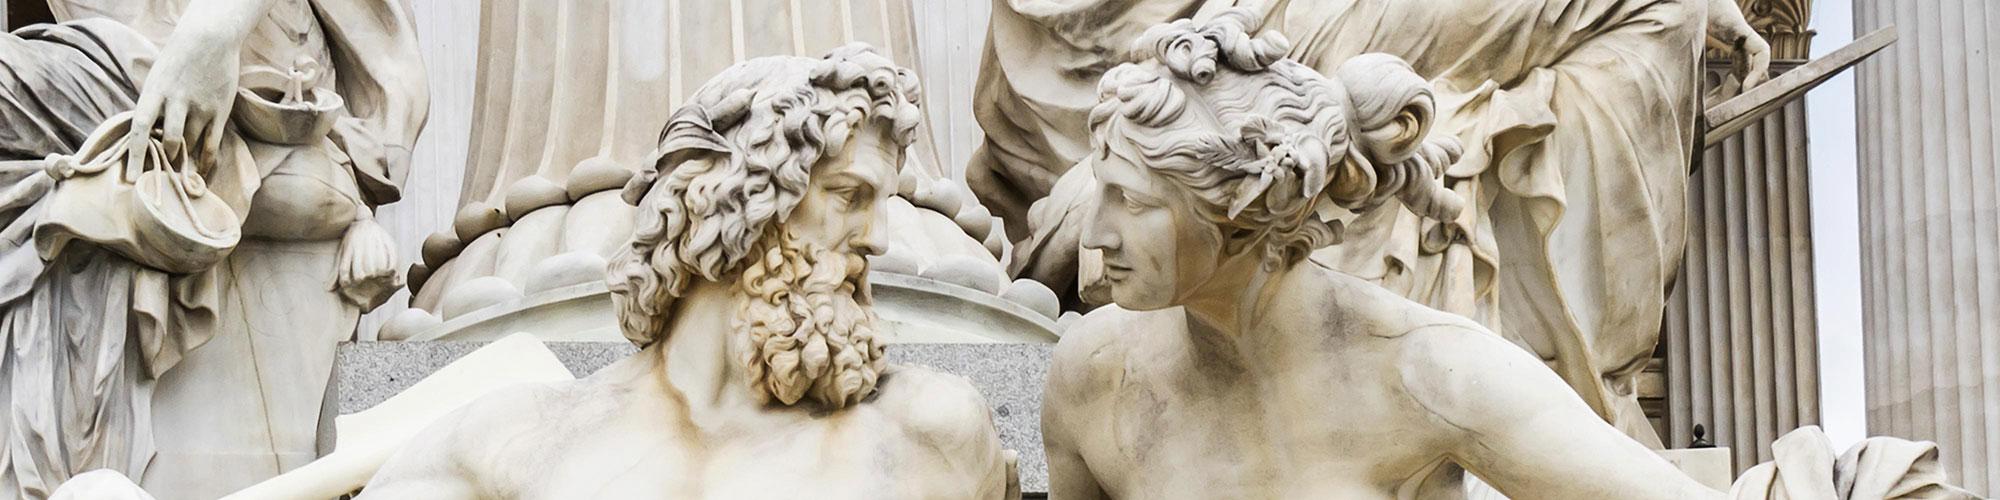 Austrian German Cultural Stone Statues